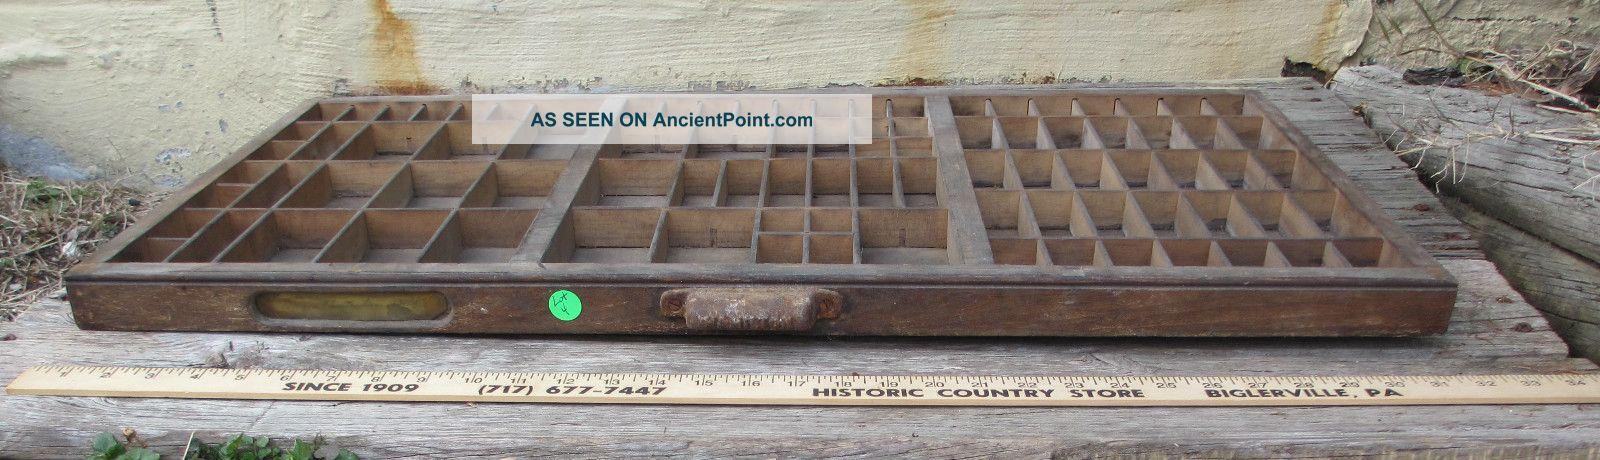 Antique Letterpress Drawer Letterpress Drawer / Tray